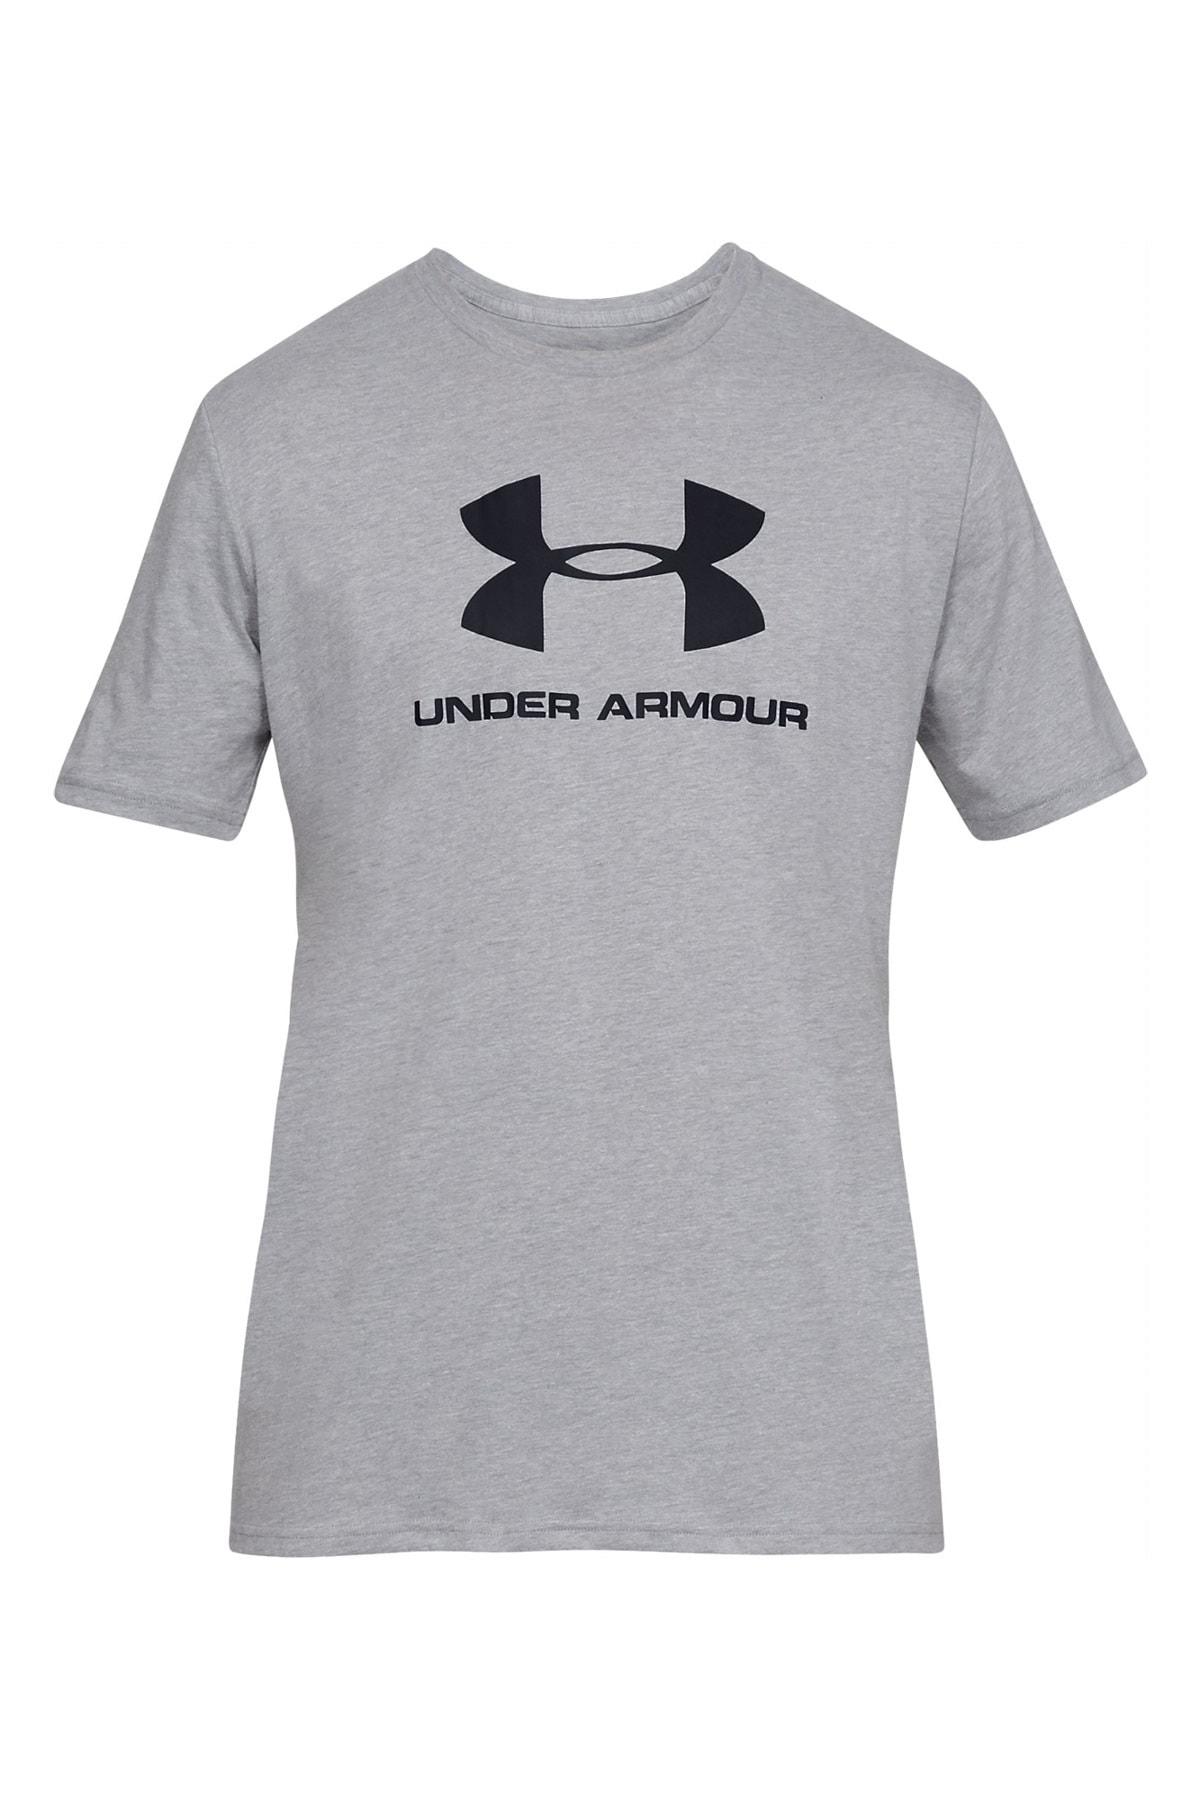 Erkek Spor T-Shirt - UA SPORTSTYLE LOGO SS - 1329590-013